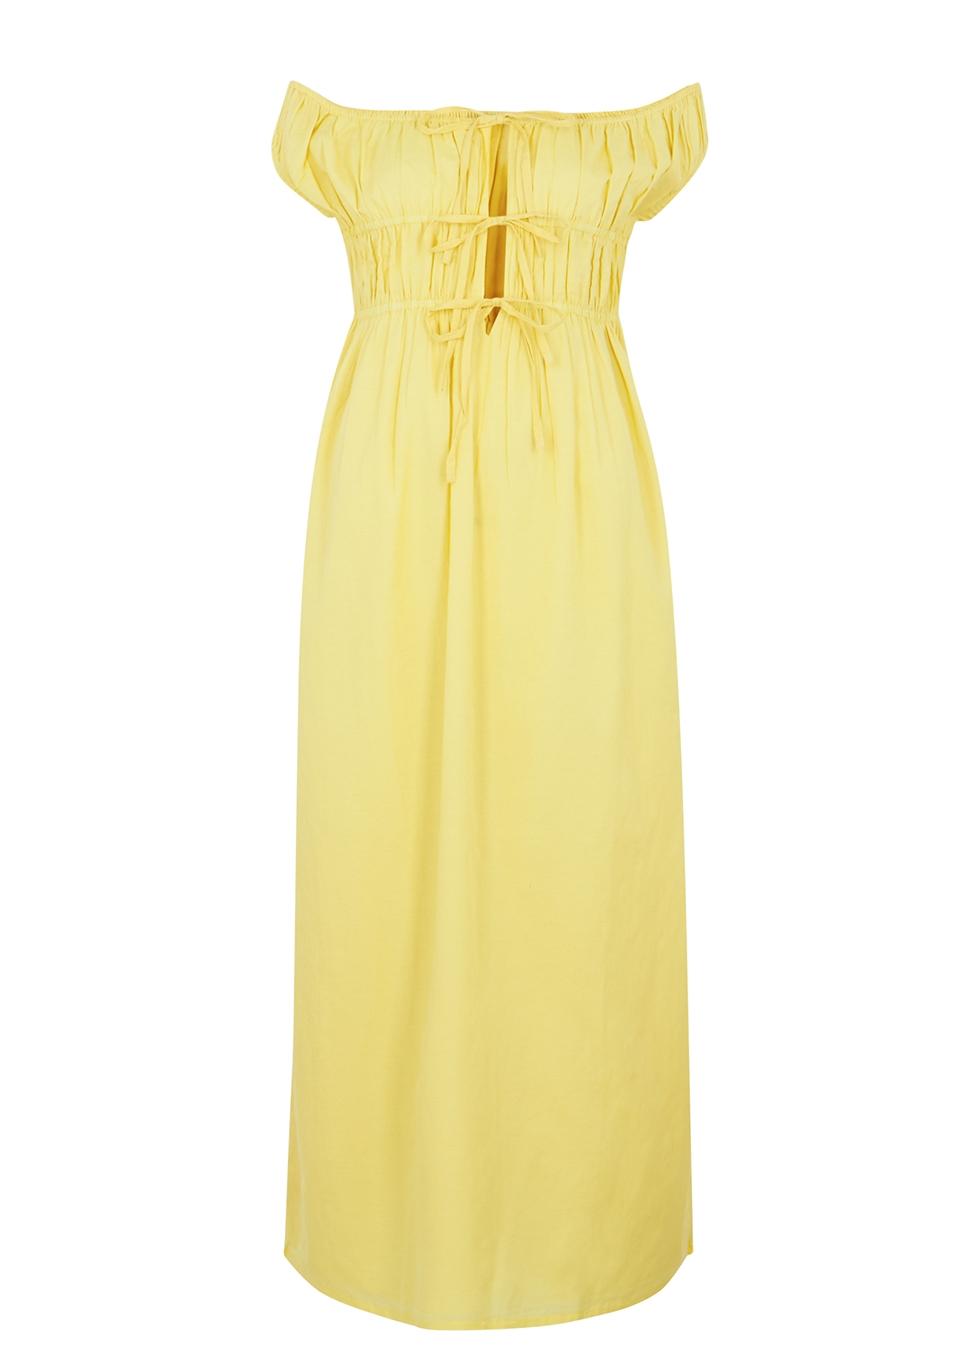 Antonia yellow off-the-shoulder midi dress